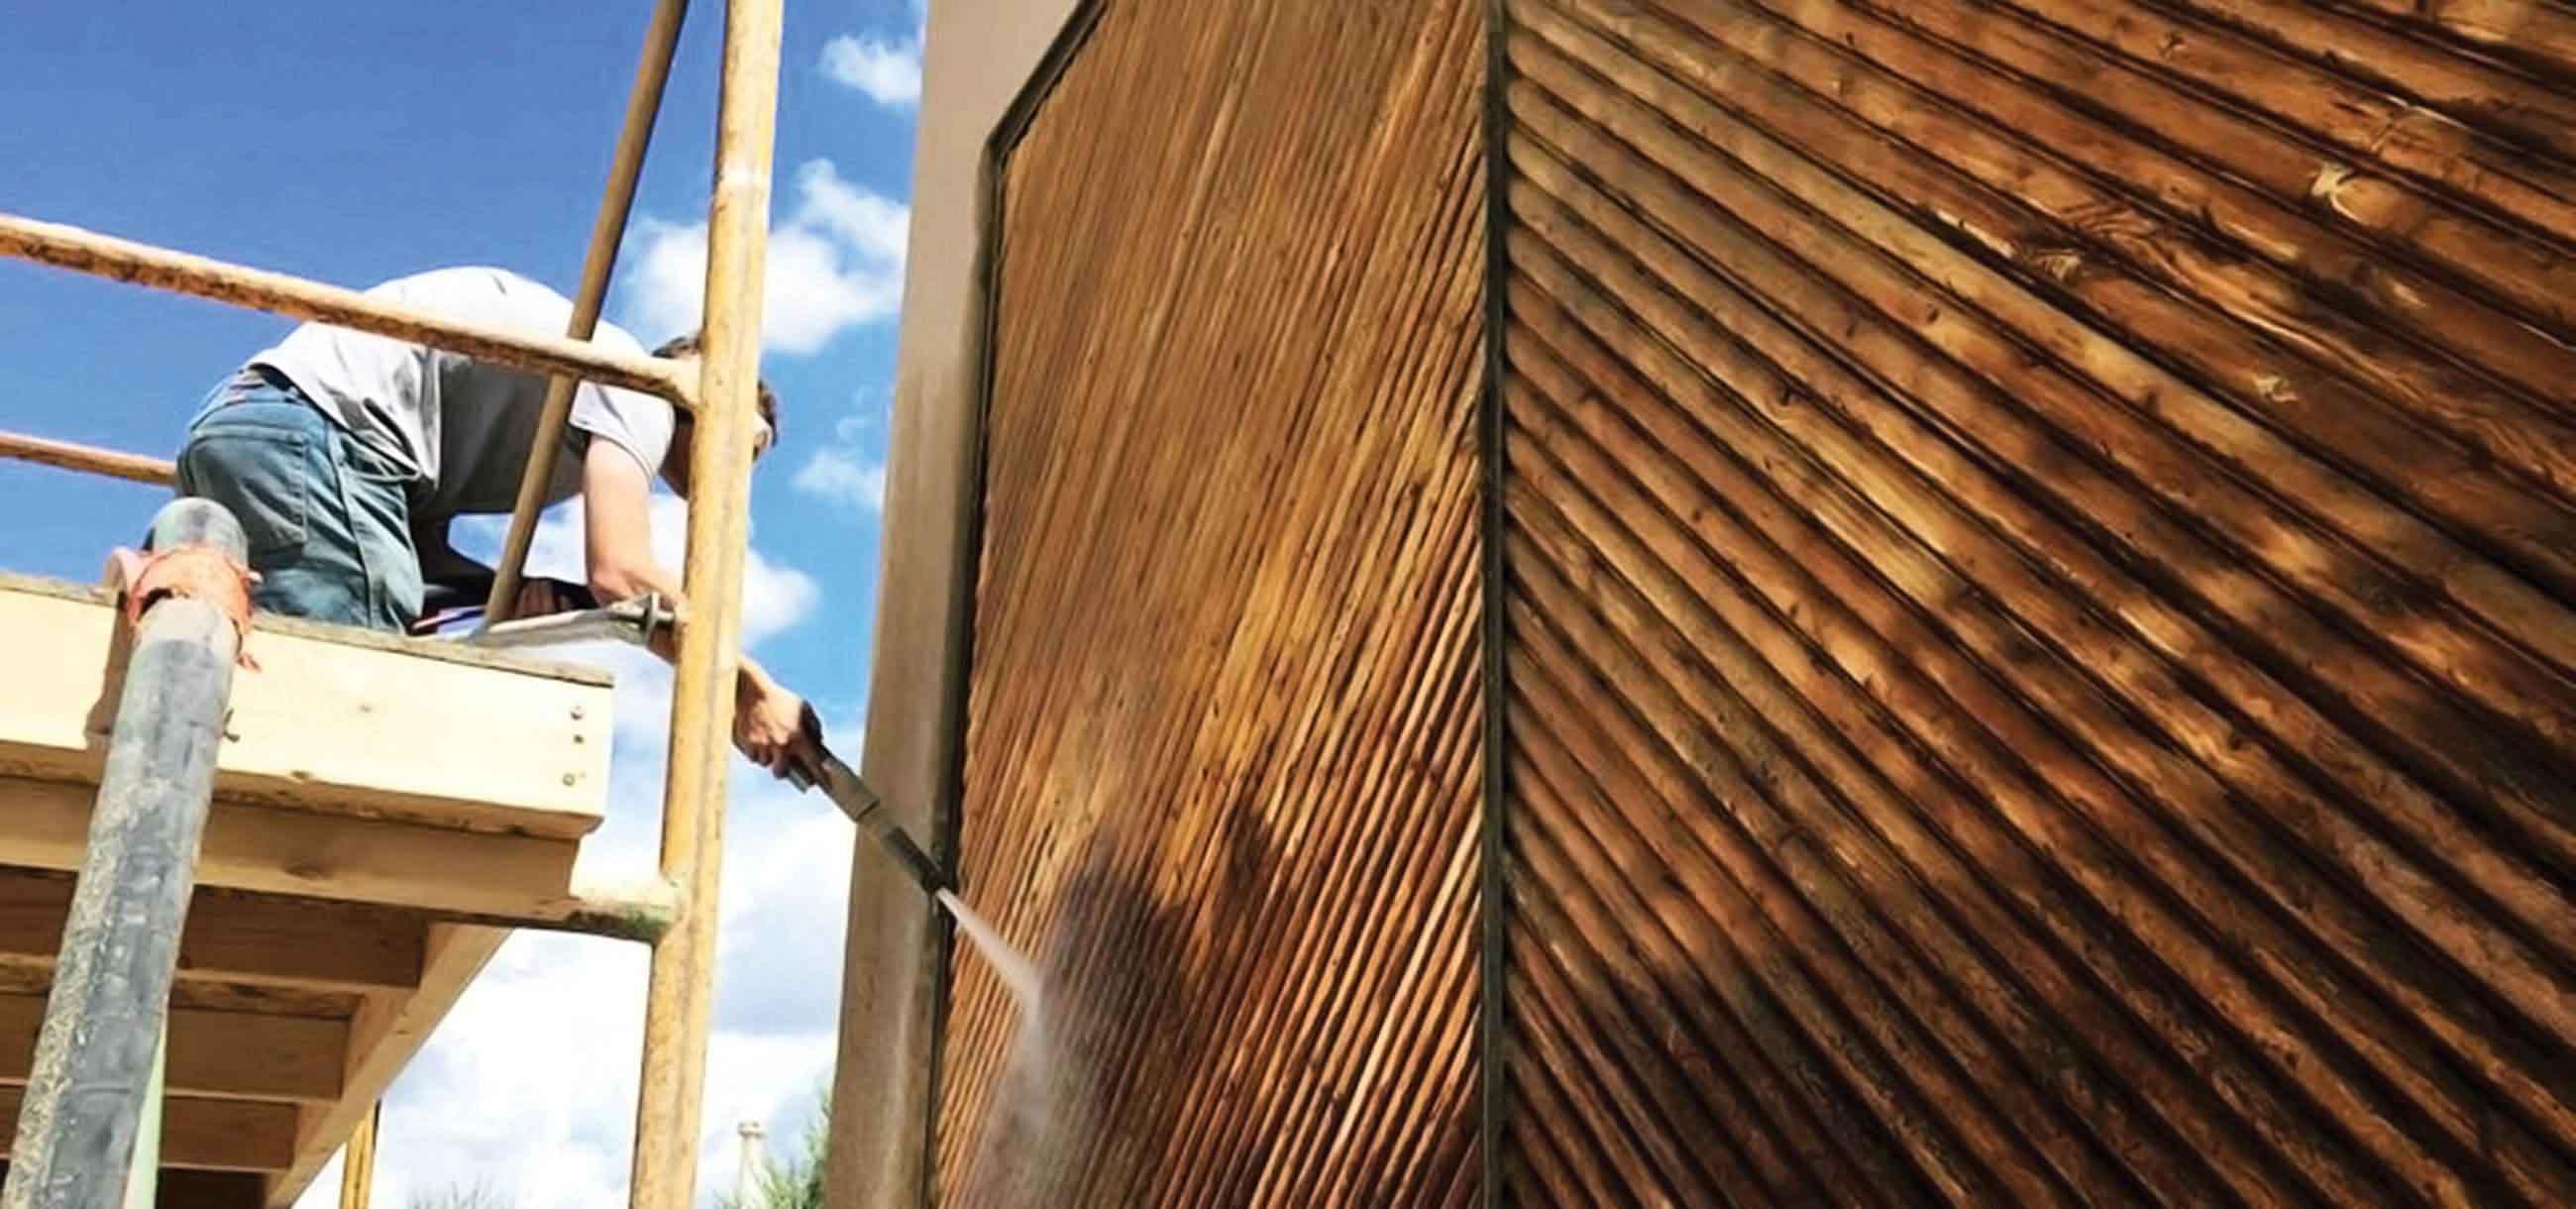 wood-panels.jpg